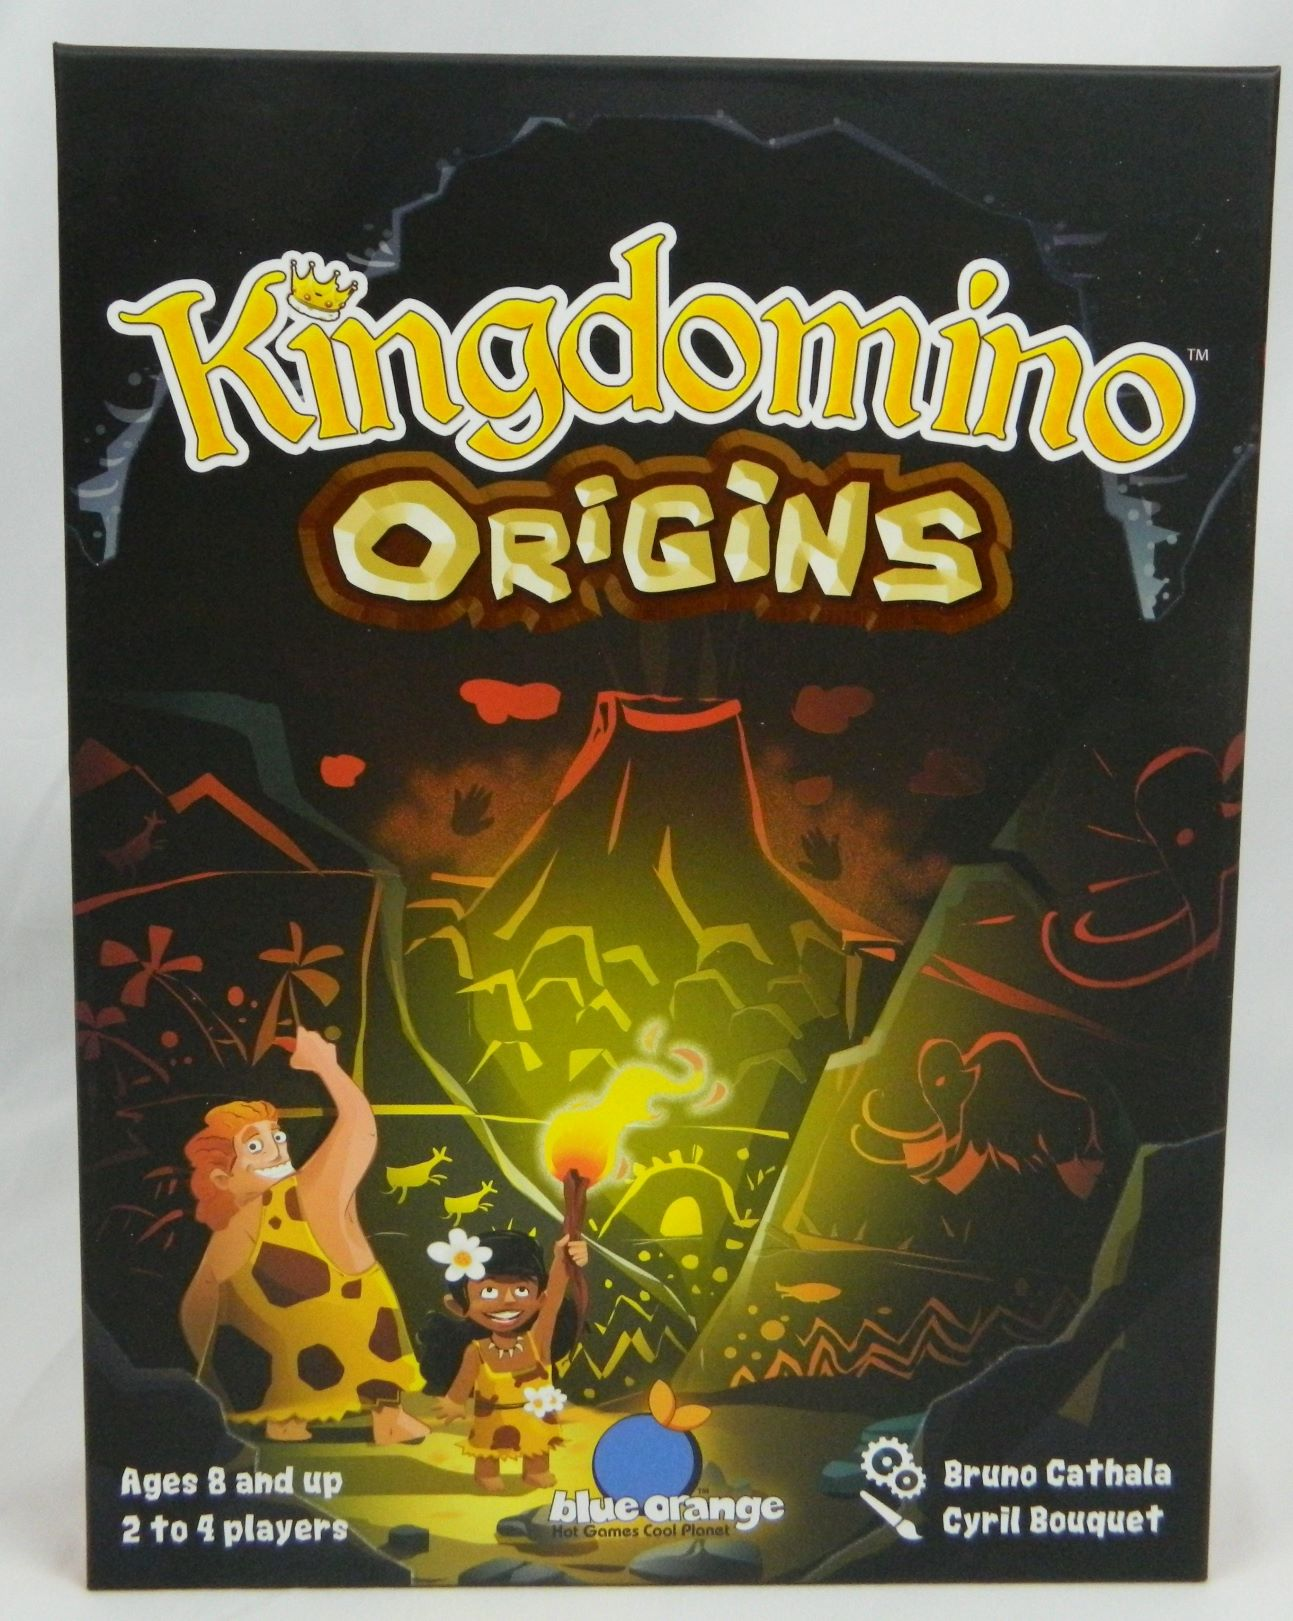 Box for Kingdomino Origins